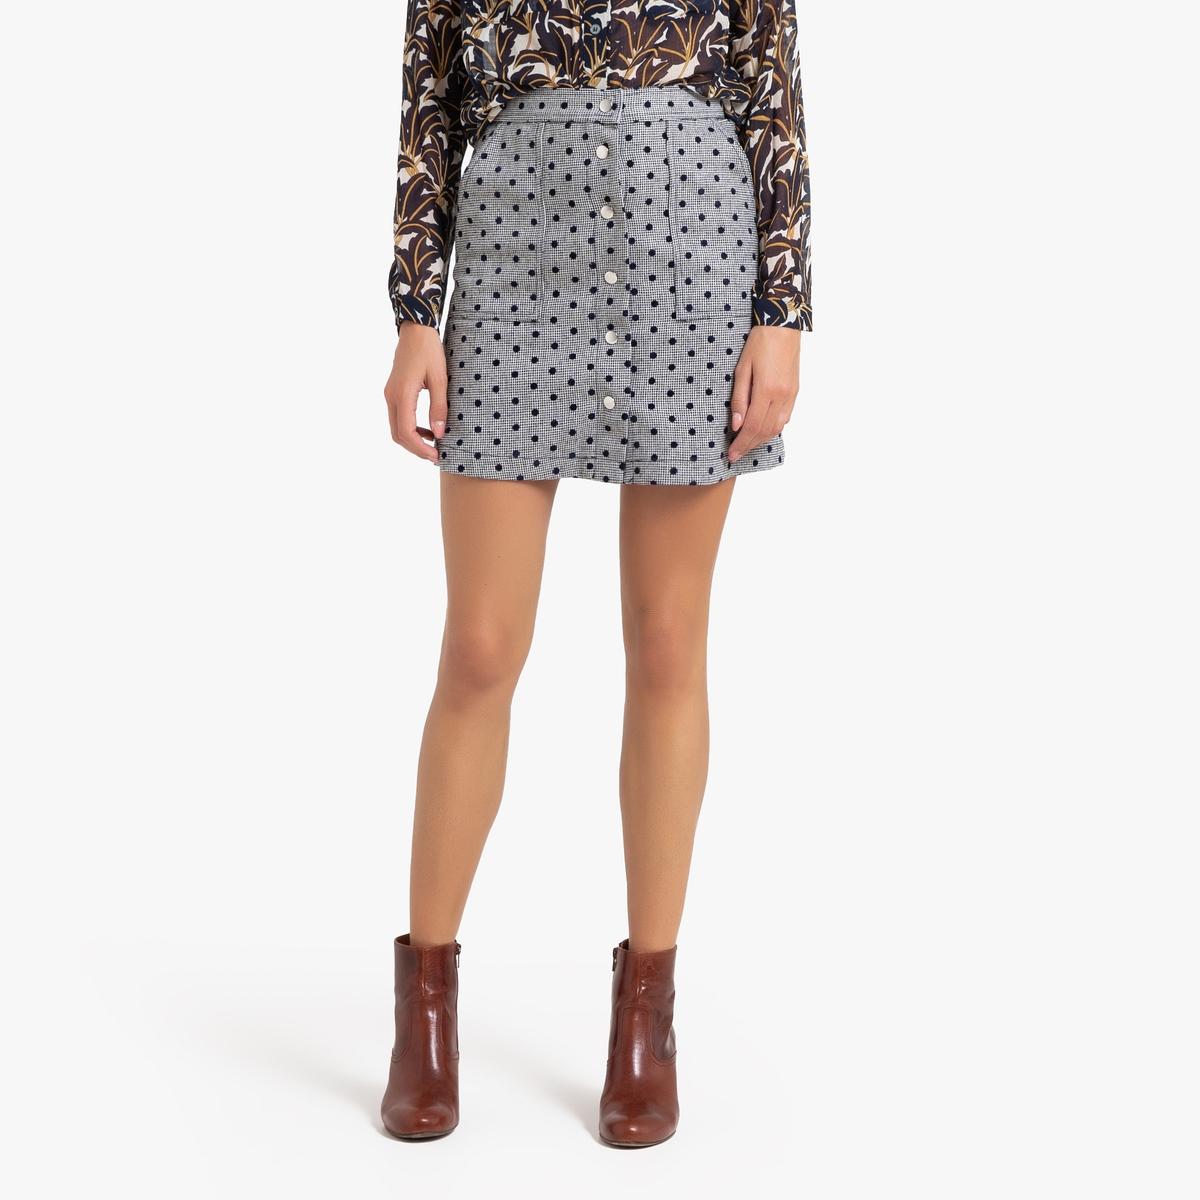 Юбка La Redoute Прямая короткая ELIANNE S серый юбка жаккардовая короткая